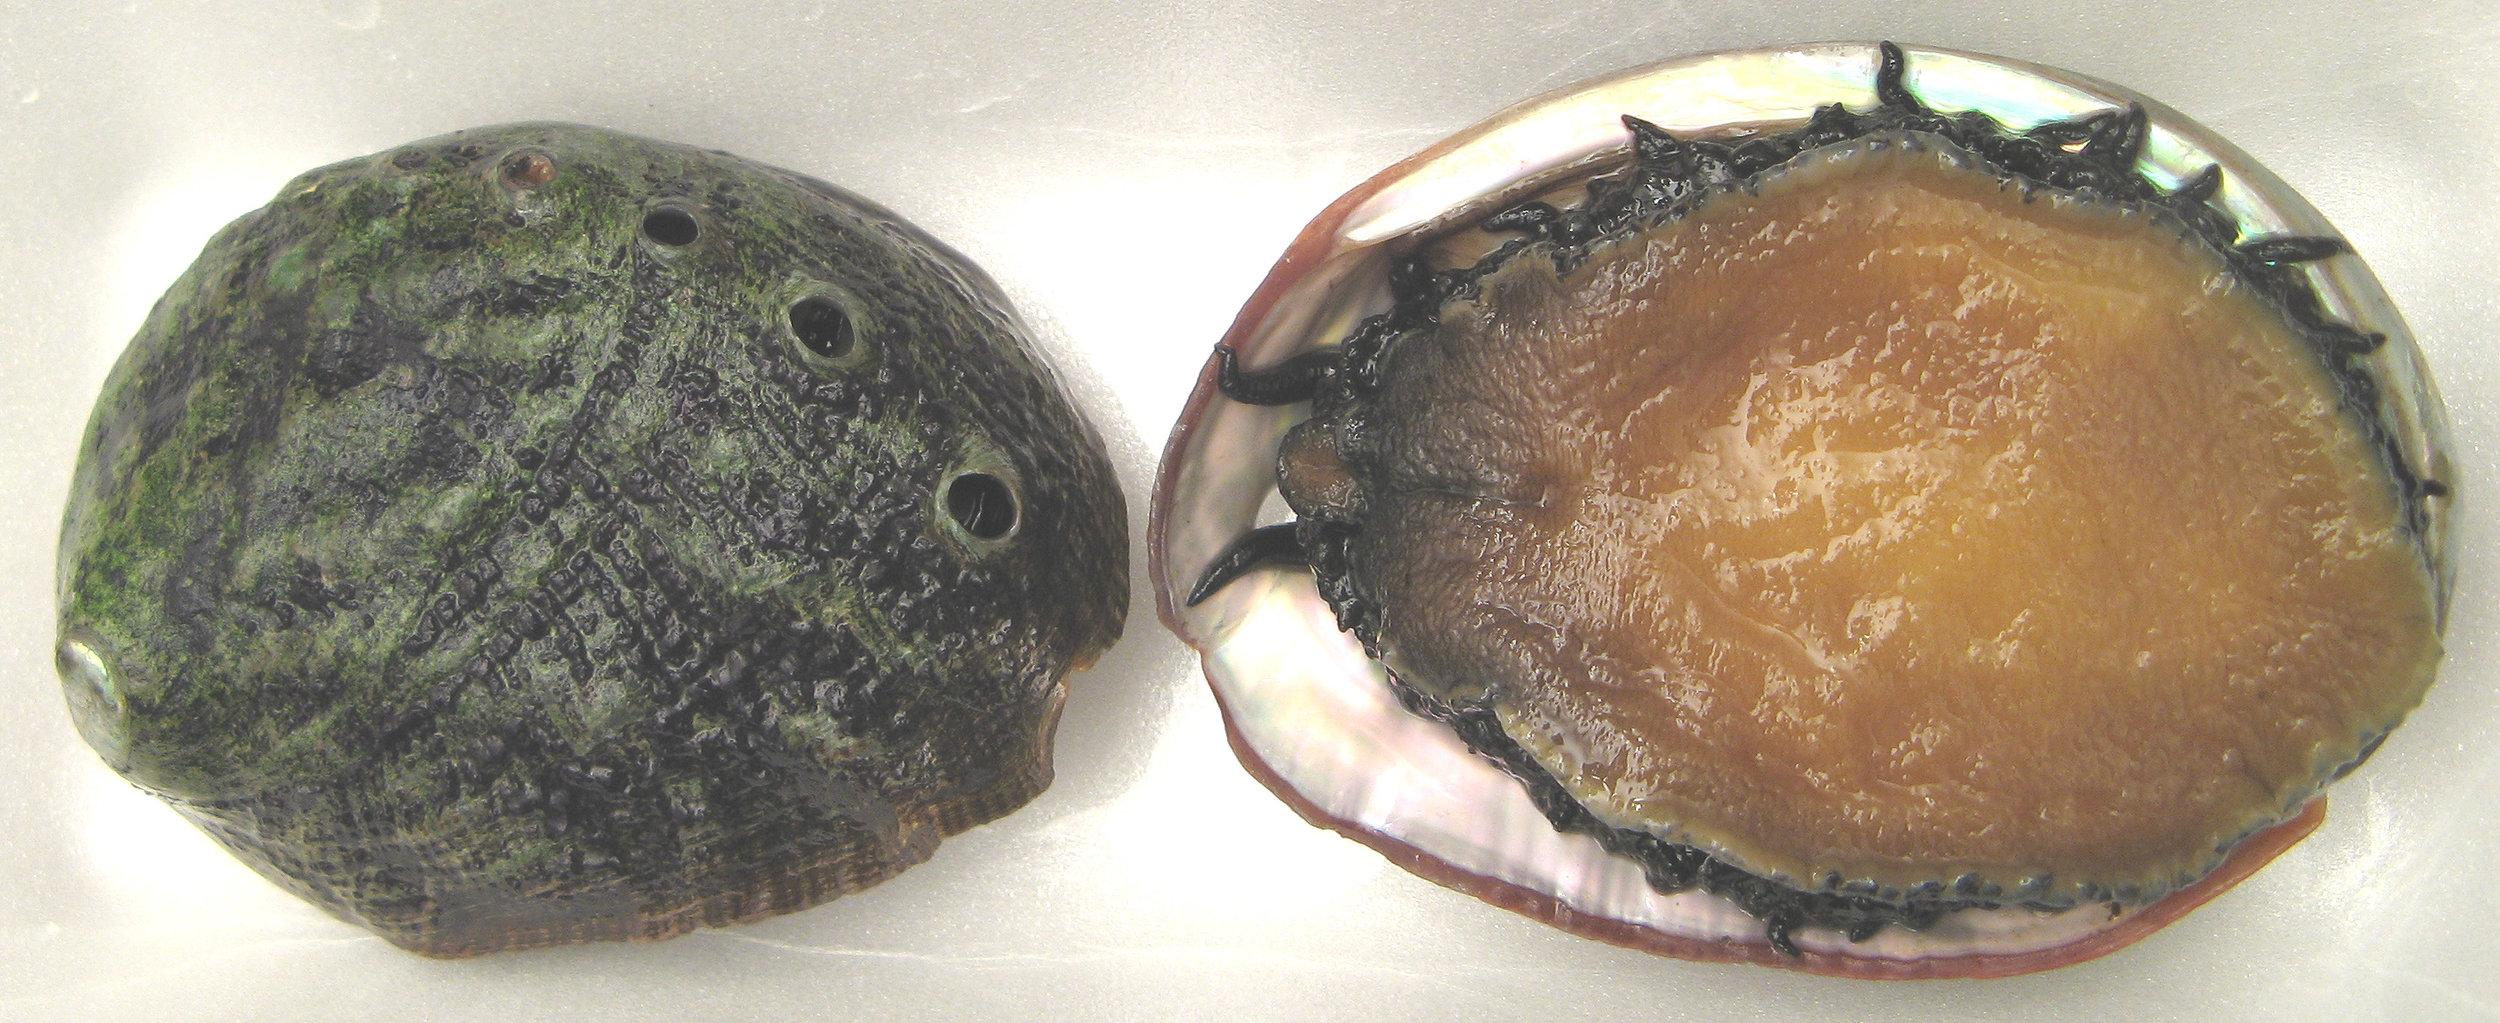 White Abalone. Photo: Wikimedia Commons